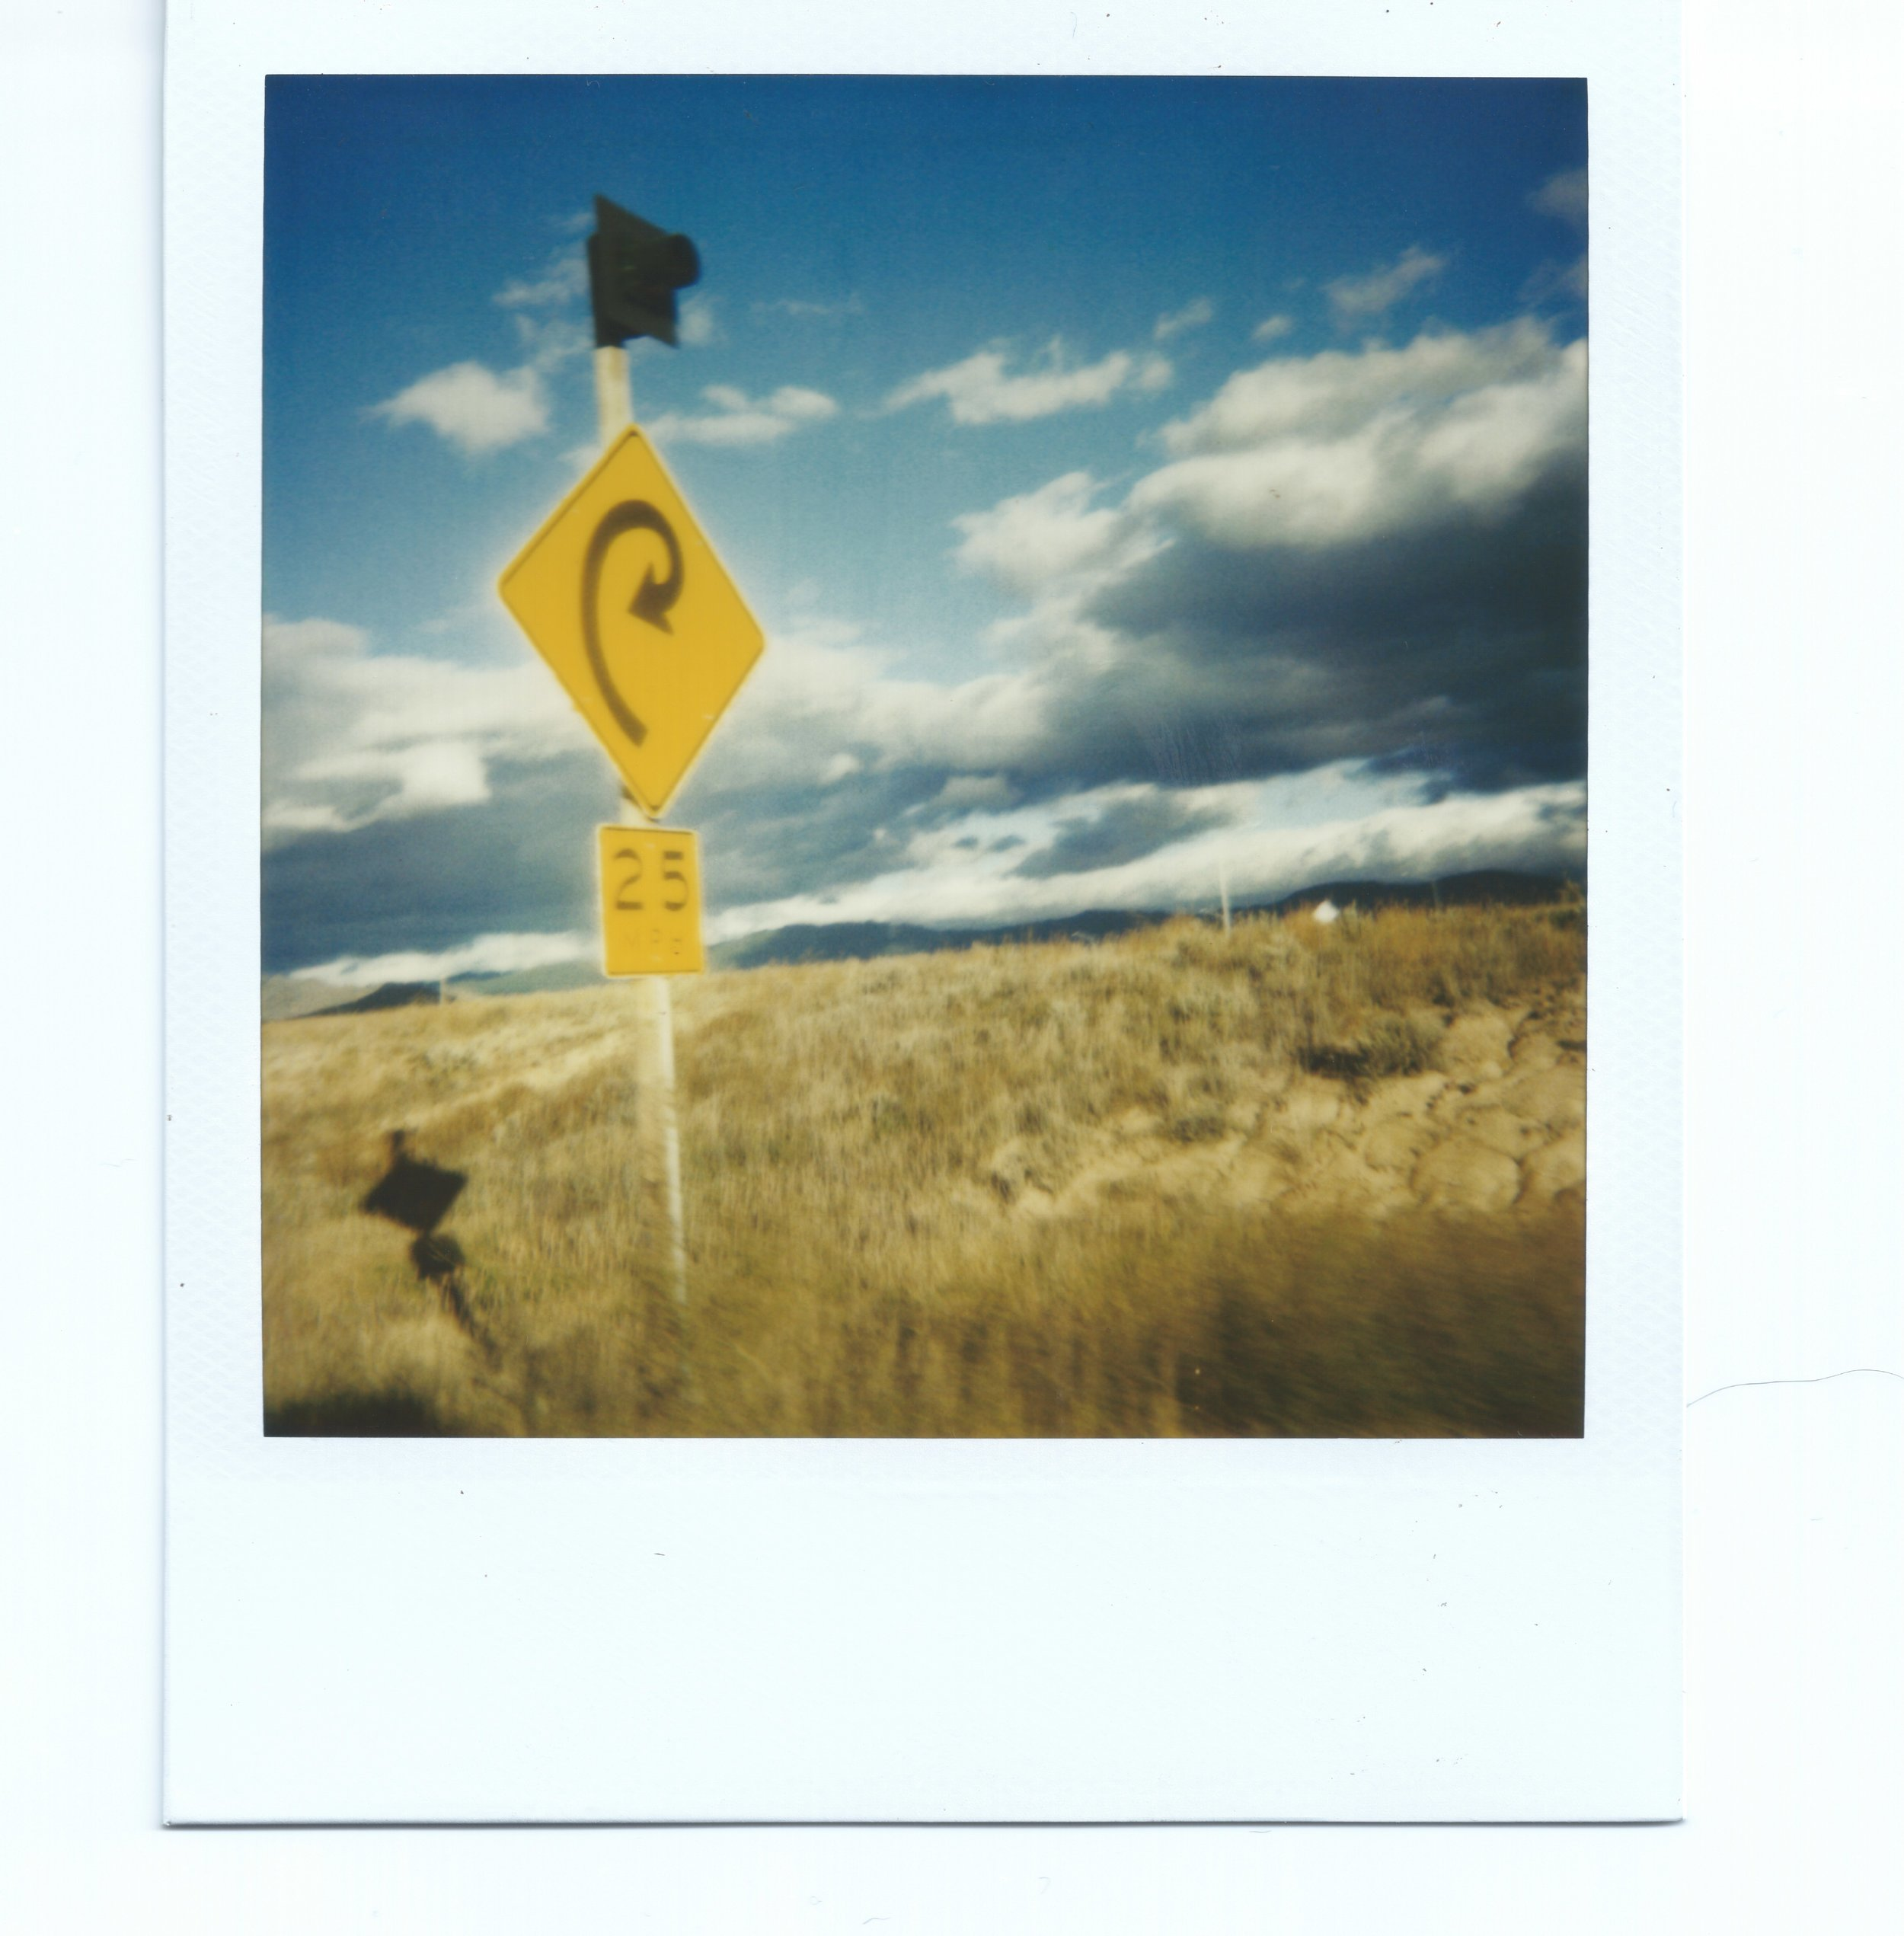 Sign_Speeddirectional.jpeg